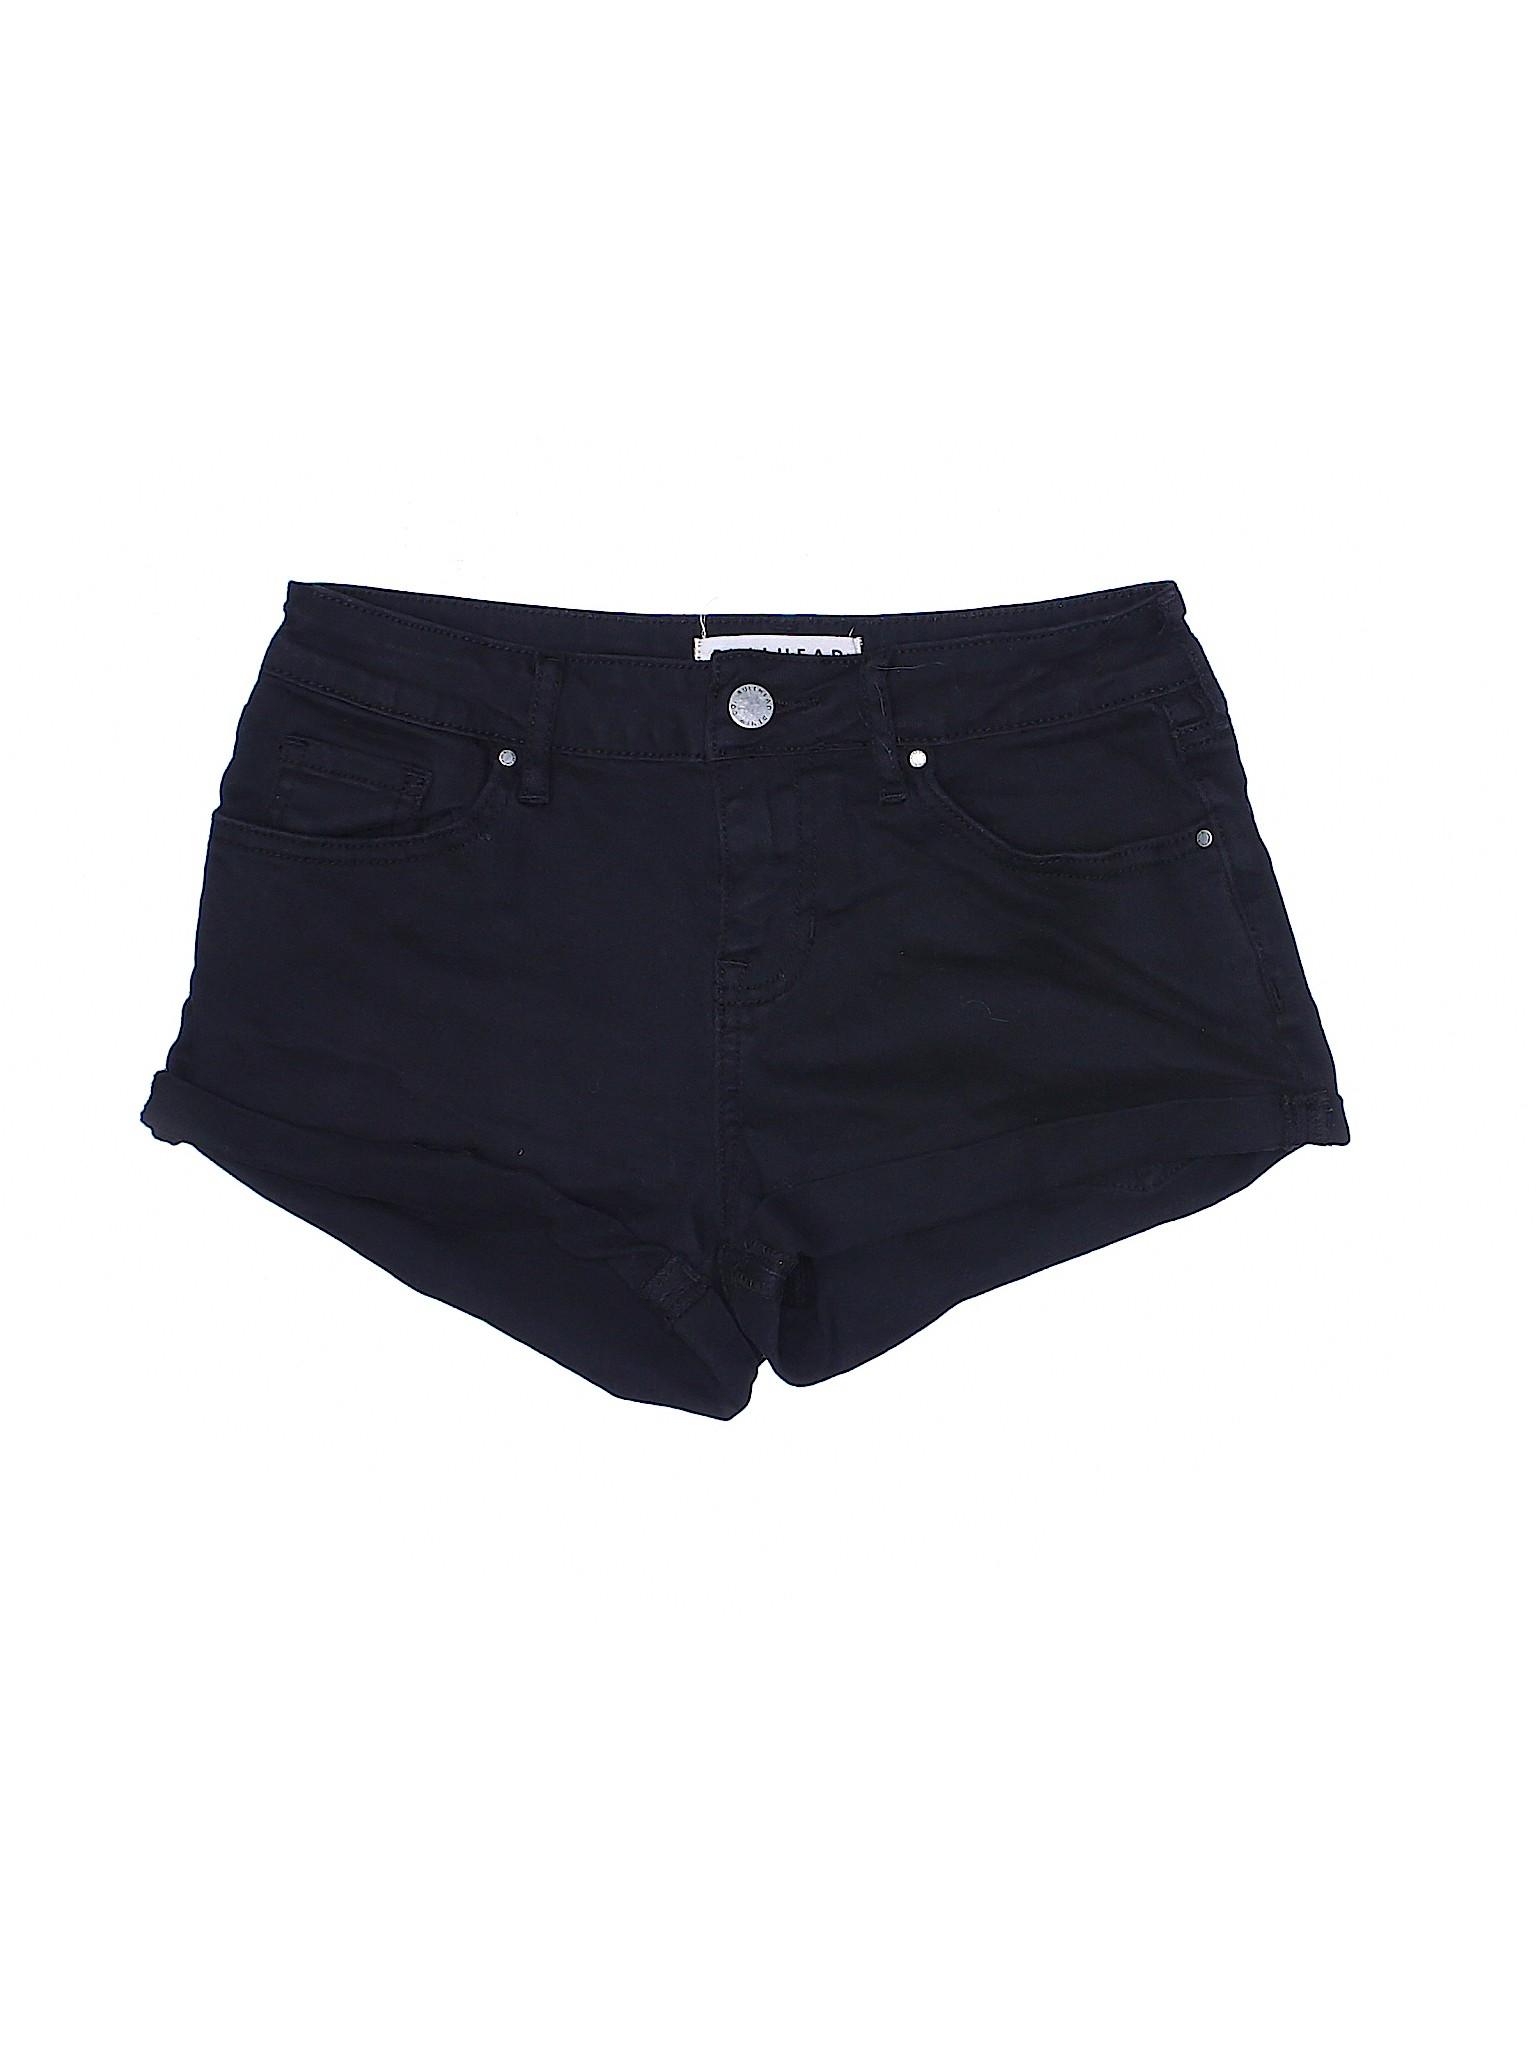 Bullhead Bullhead Denim Bullhead Boutique Denim Shorts Shorts Boutique Denim Boutique Boutique Shorts AO0WqYHw